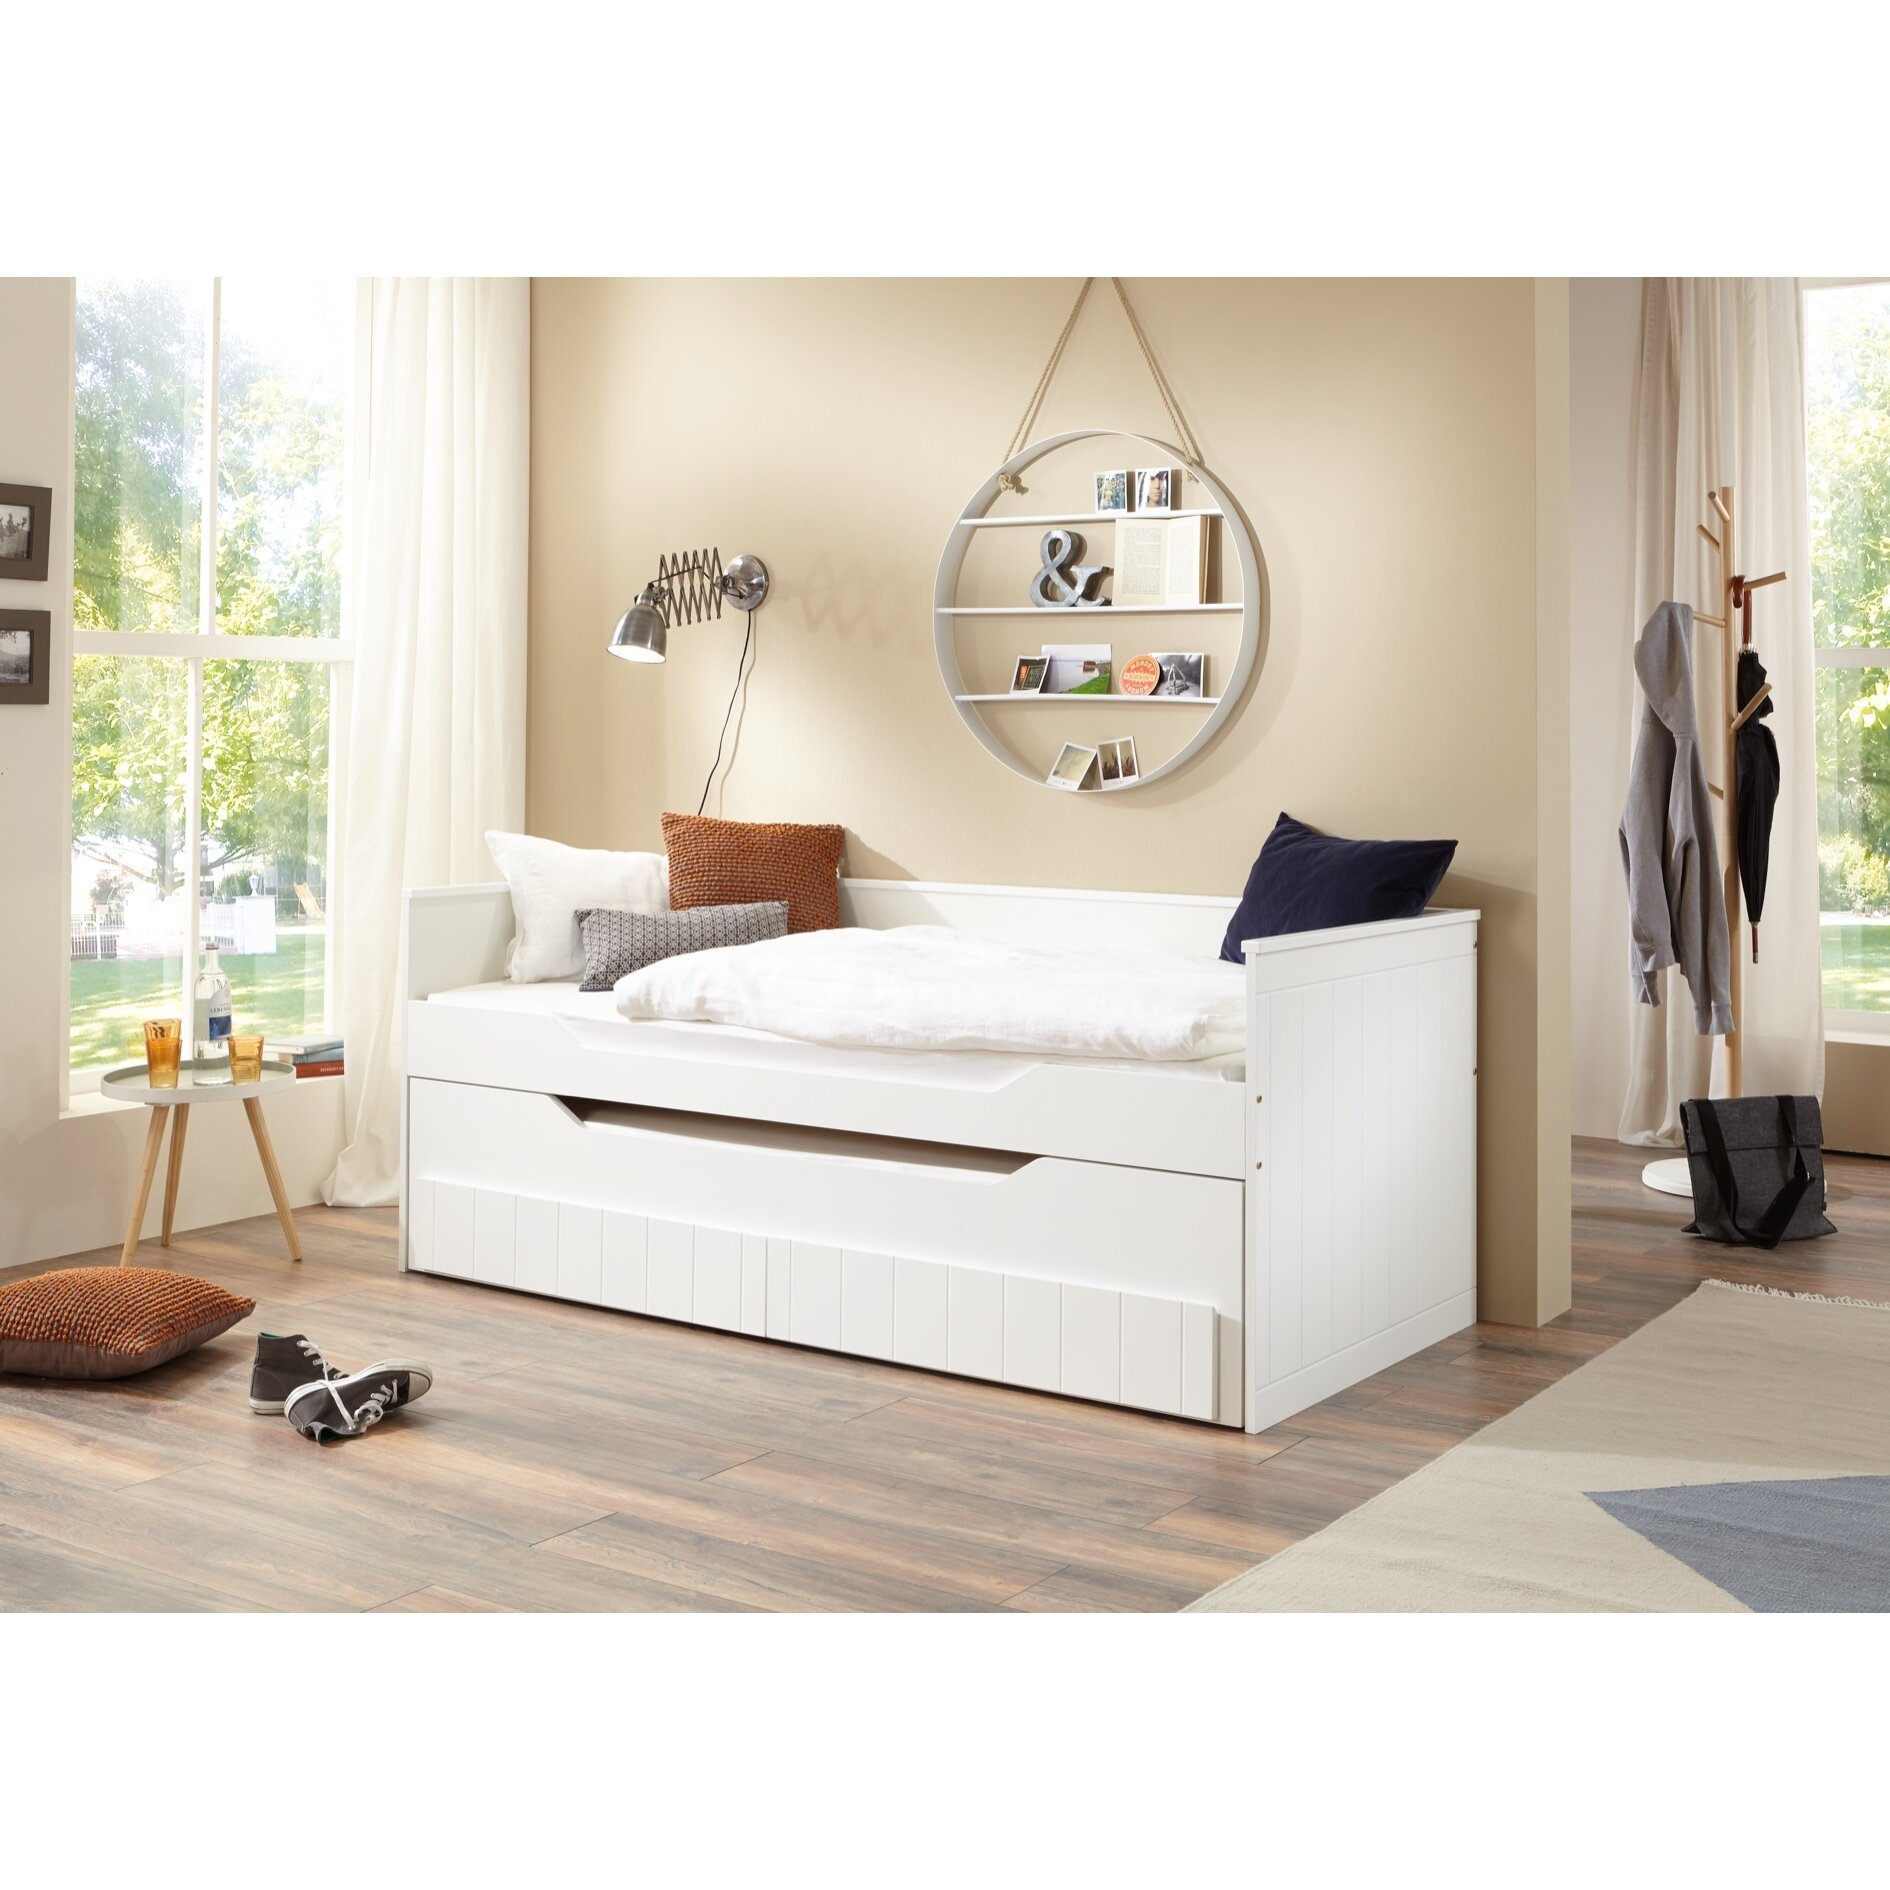 relita standard bett ronny mit g stebett 90 x 200 cm bewertungen. Black Bedroom Furniture Sets. Home Design Ideas